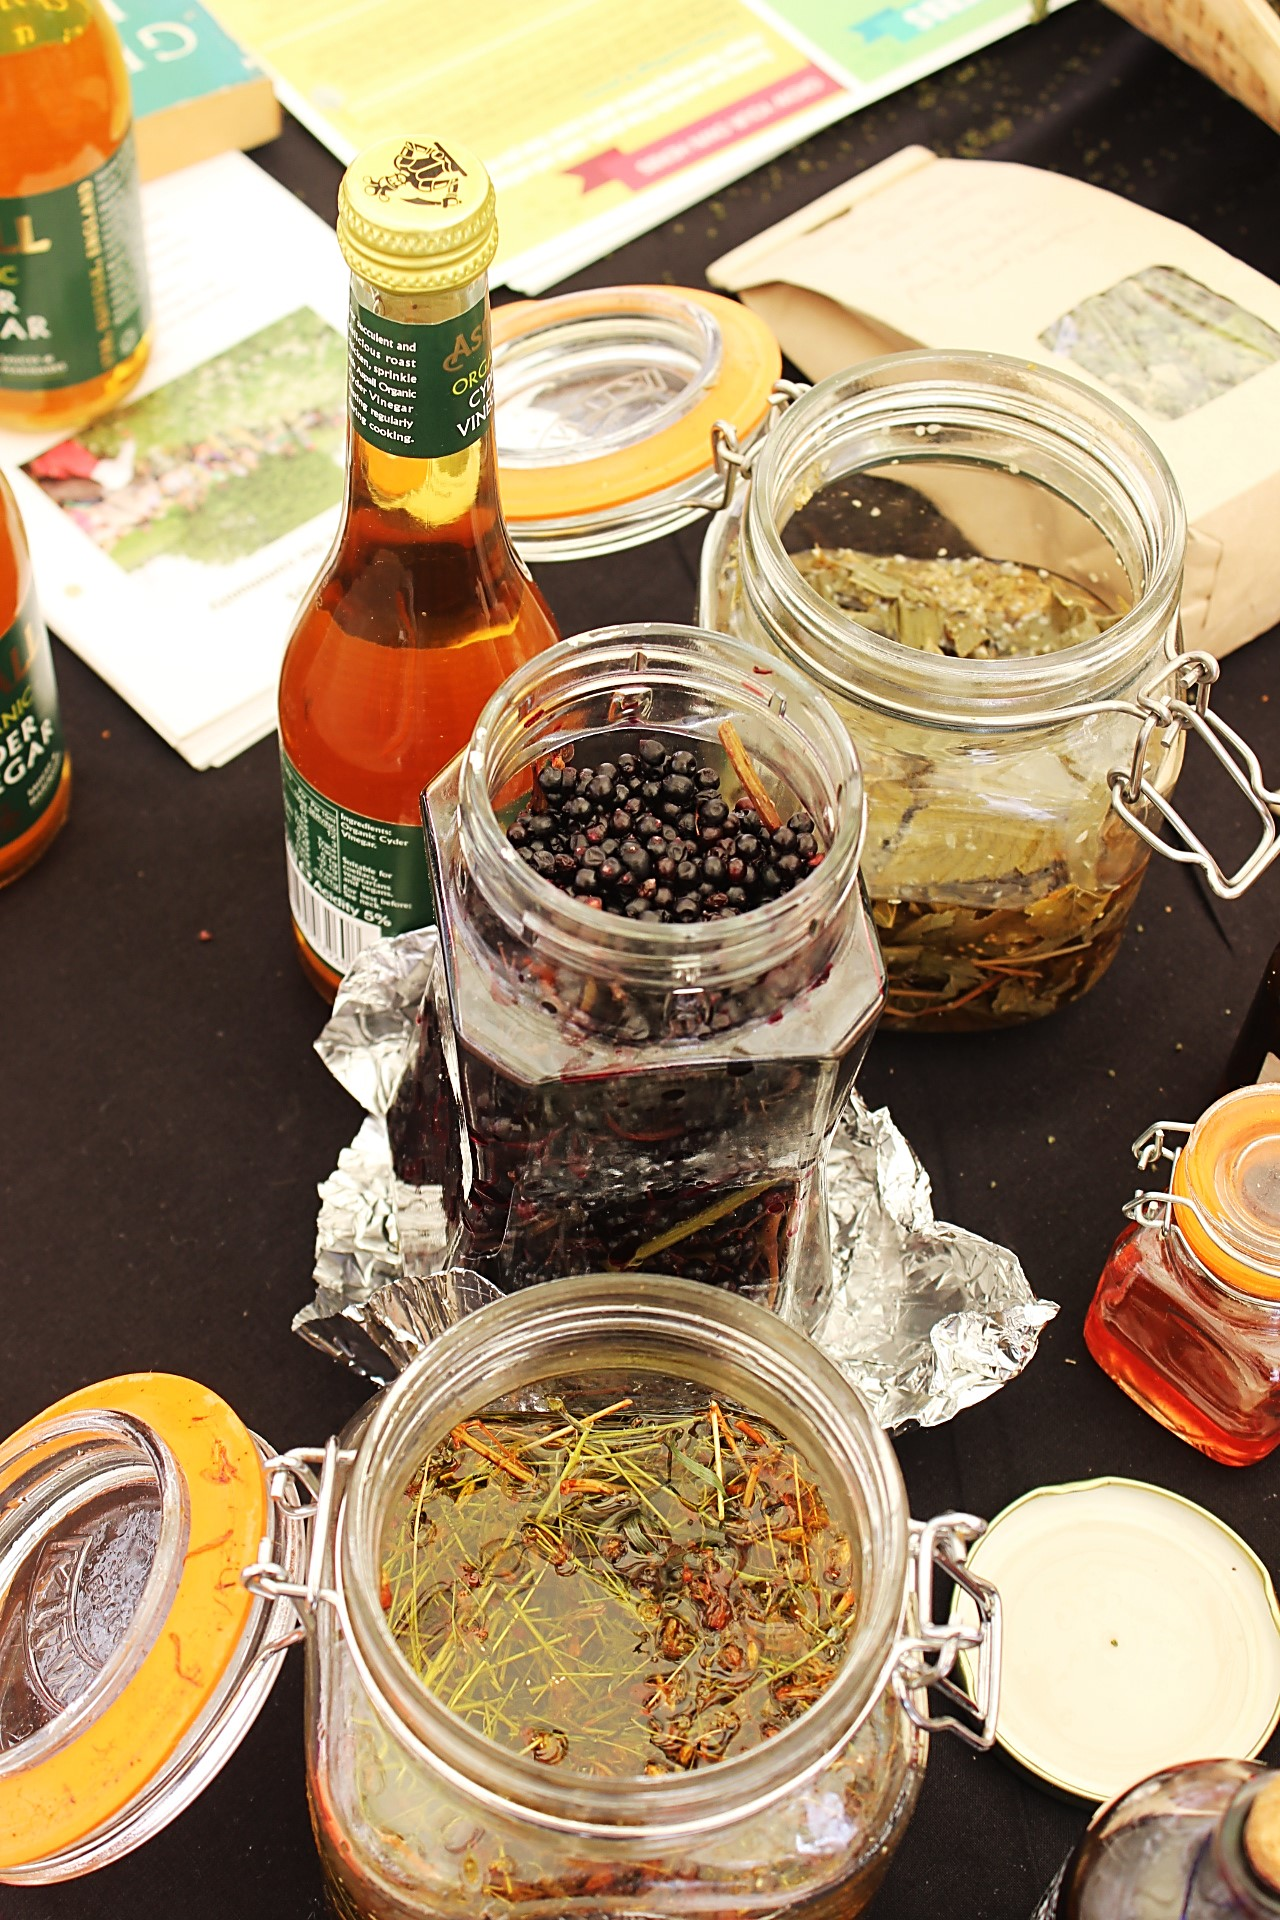 Medicinal Herb Workshop with Rasheeqa Ahmed ( www.hedgeherbs.org.uk )